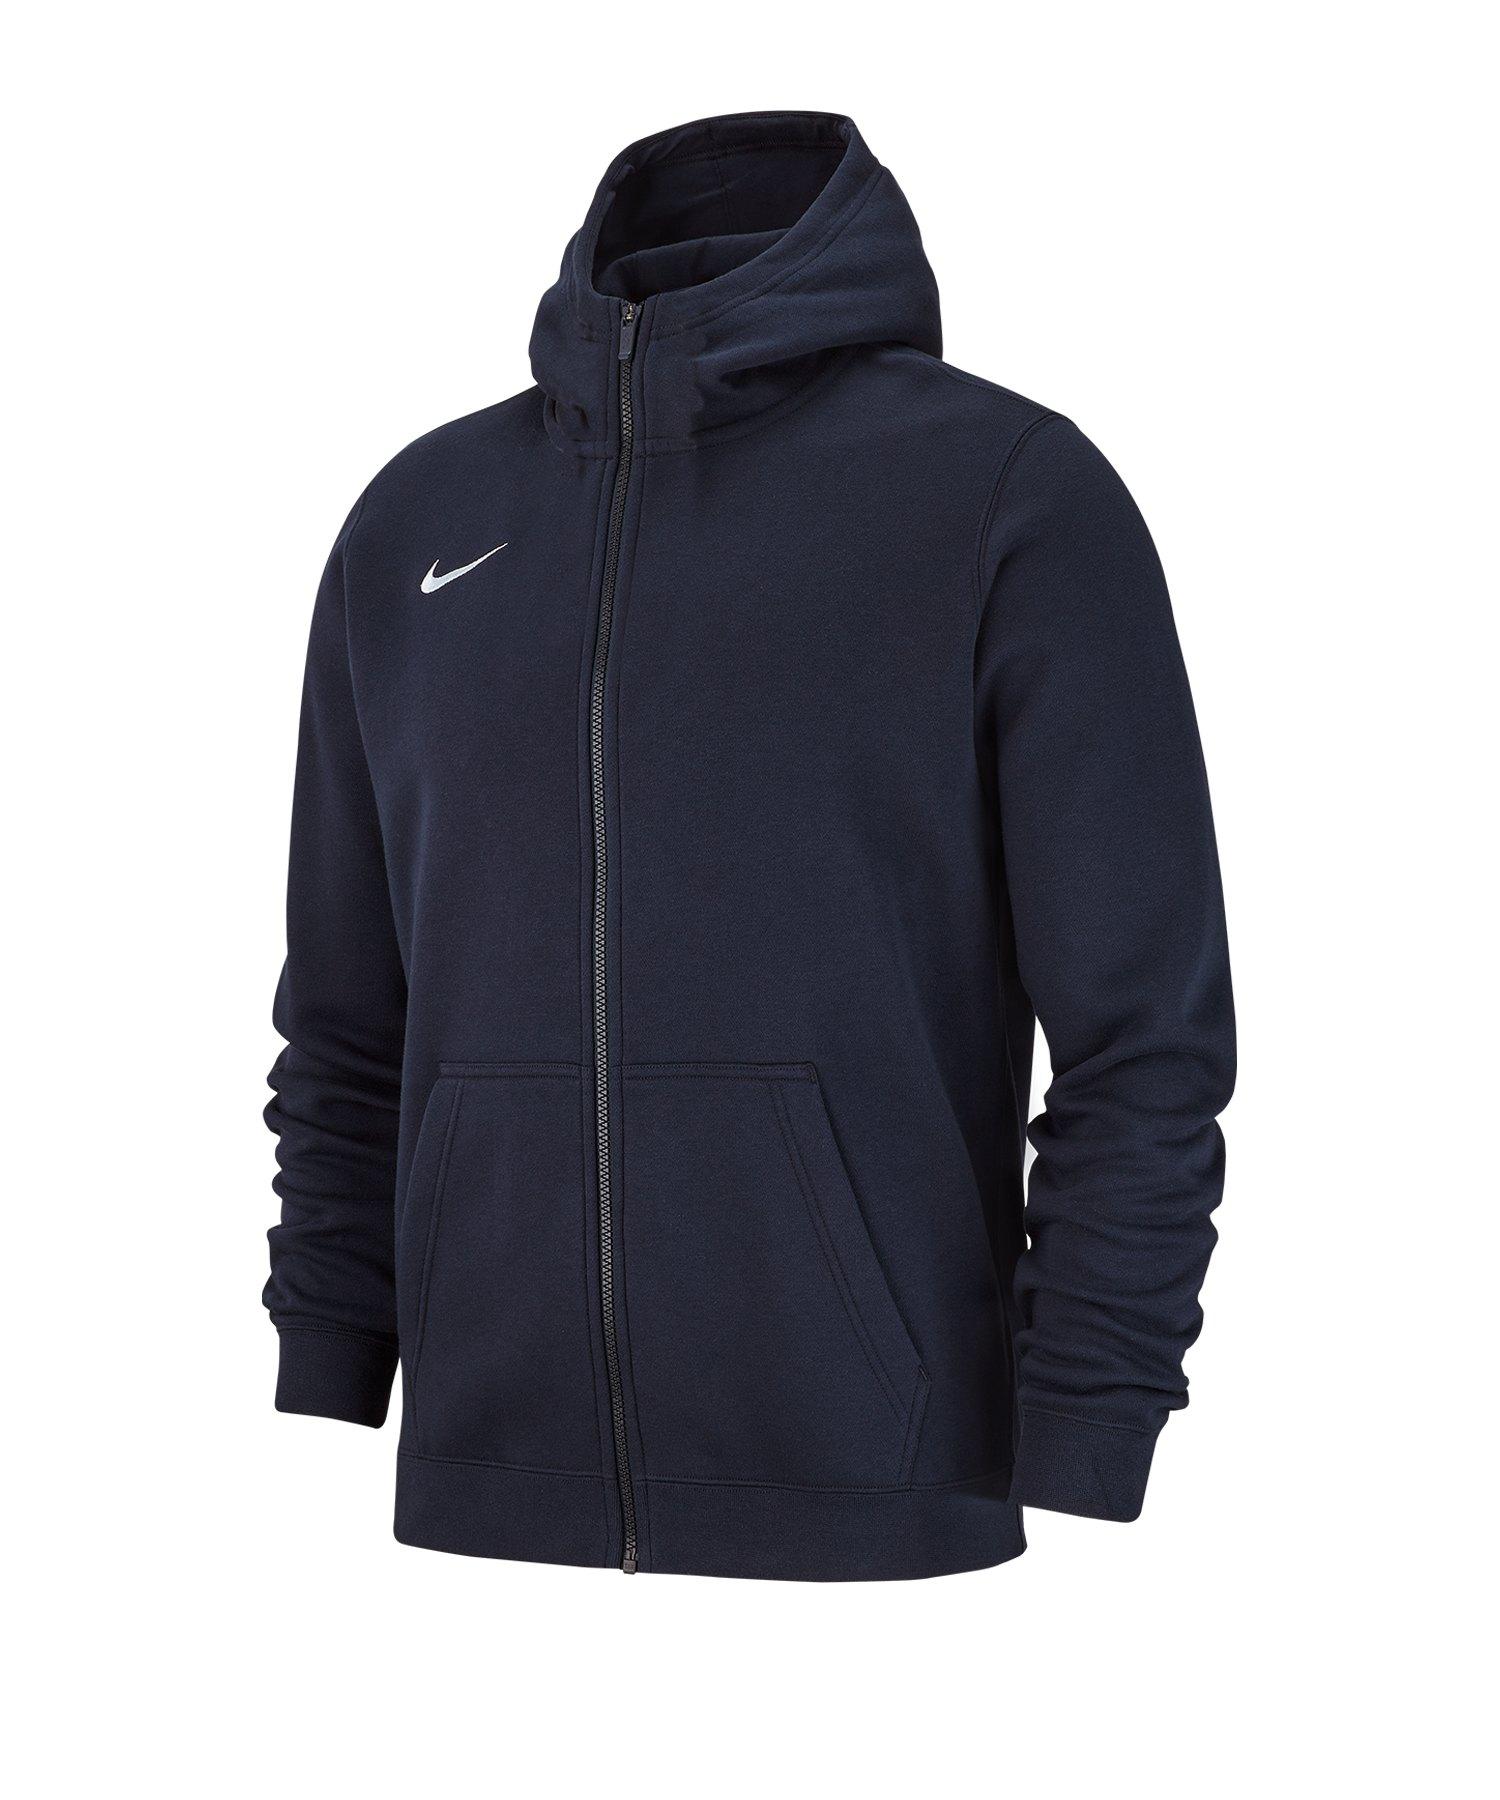 Nike Club 19 Fleece Kapuzenjacke Kids Blau F451 - blau